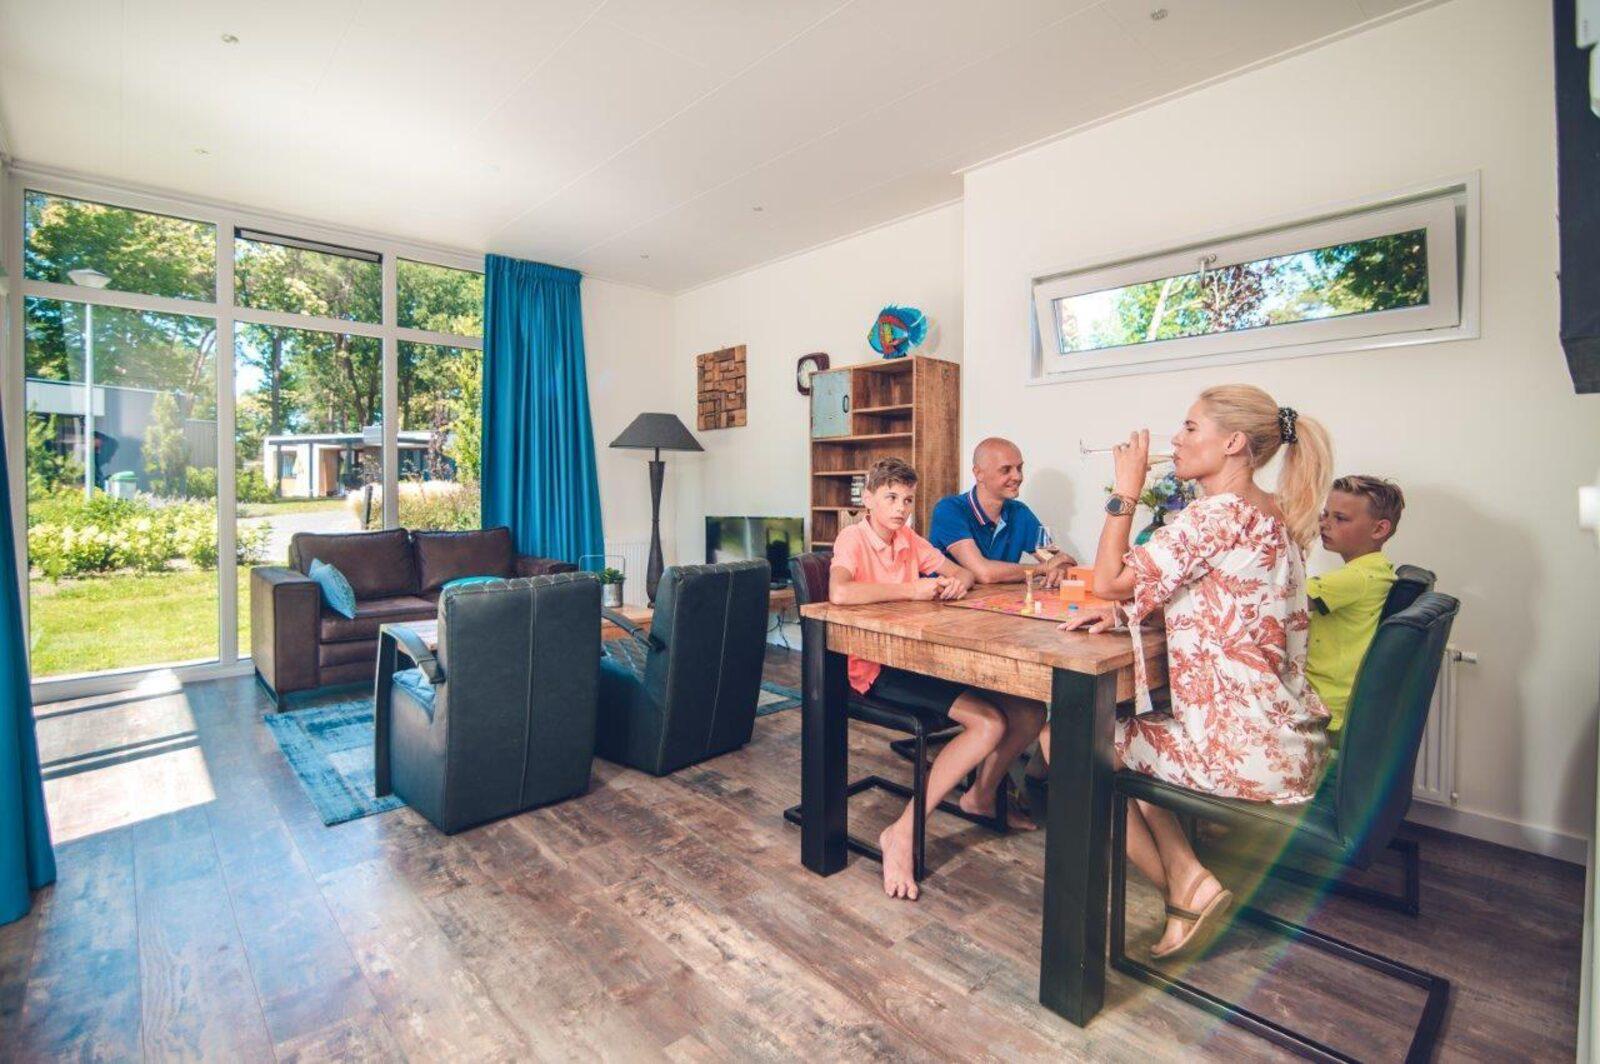 Holiday Villa | 4 people